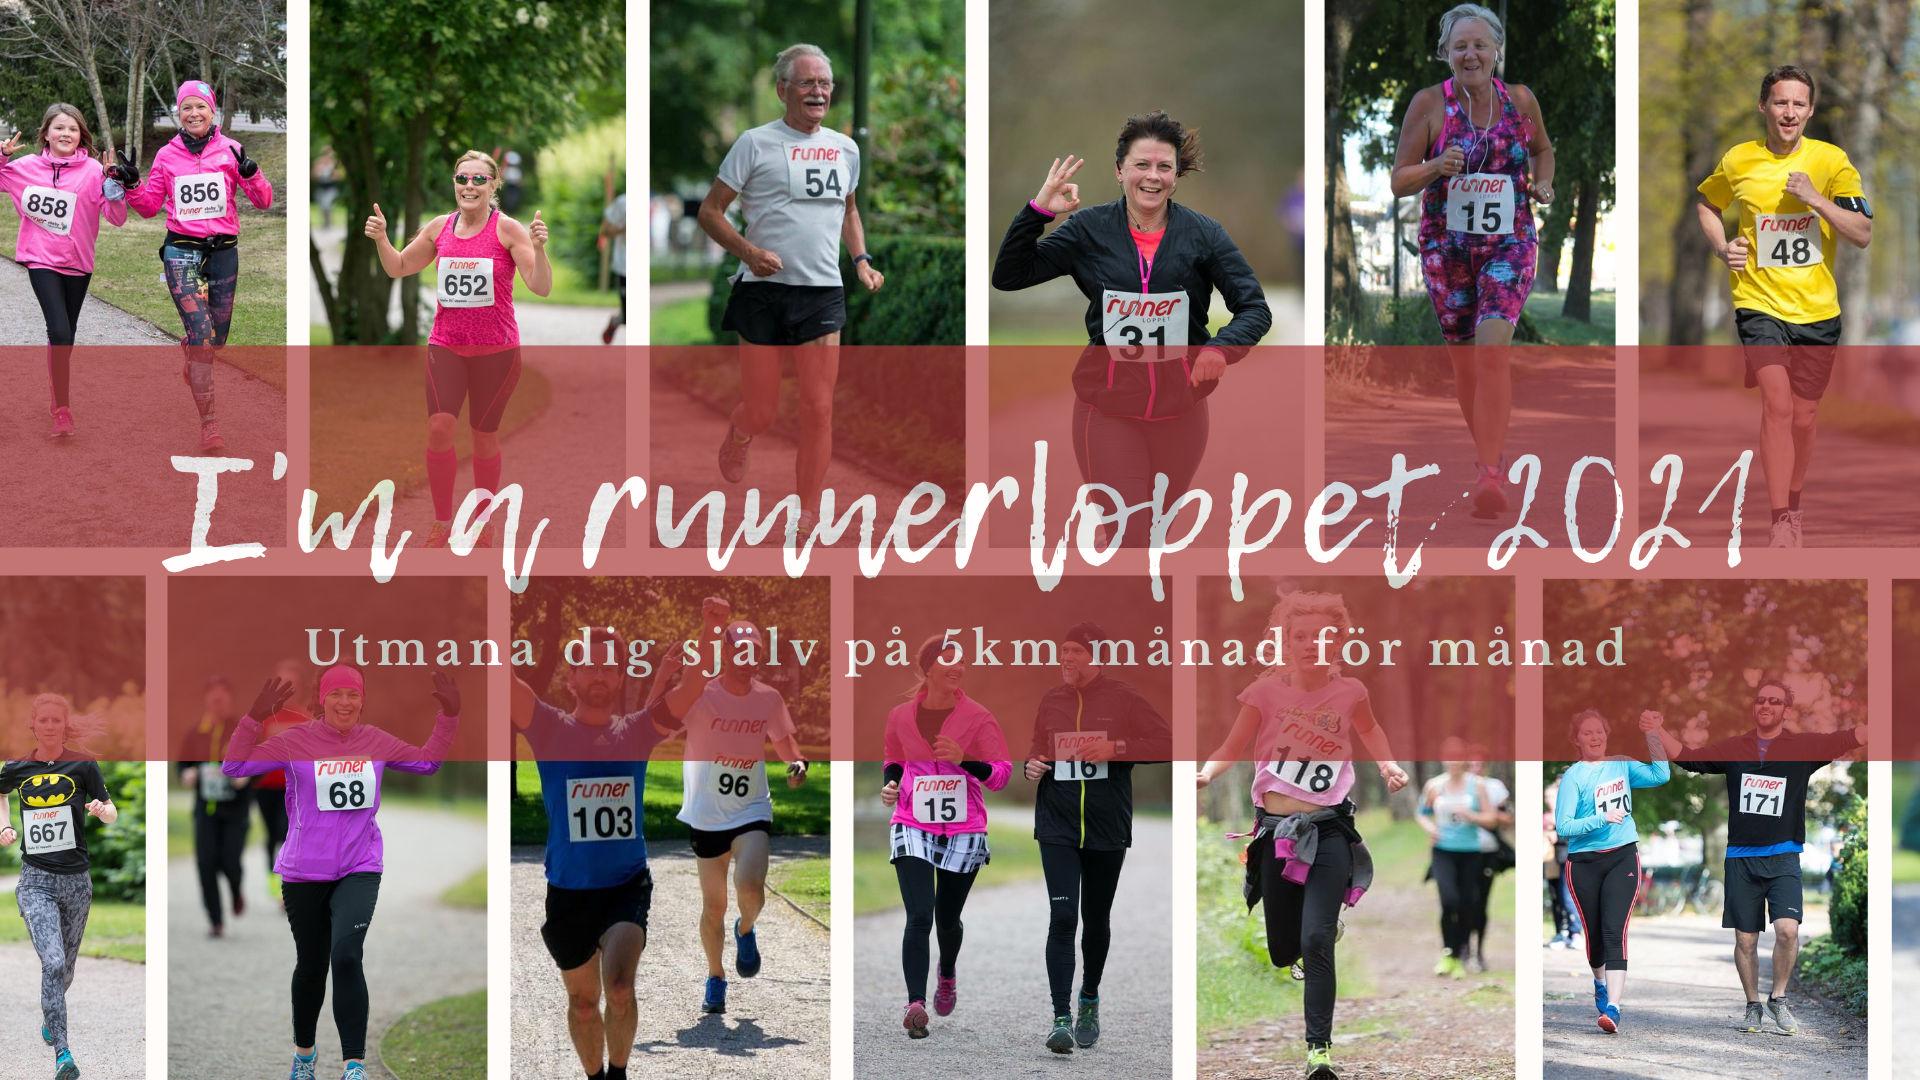 I'm a runnerloppet - Lopp 4 av 6